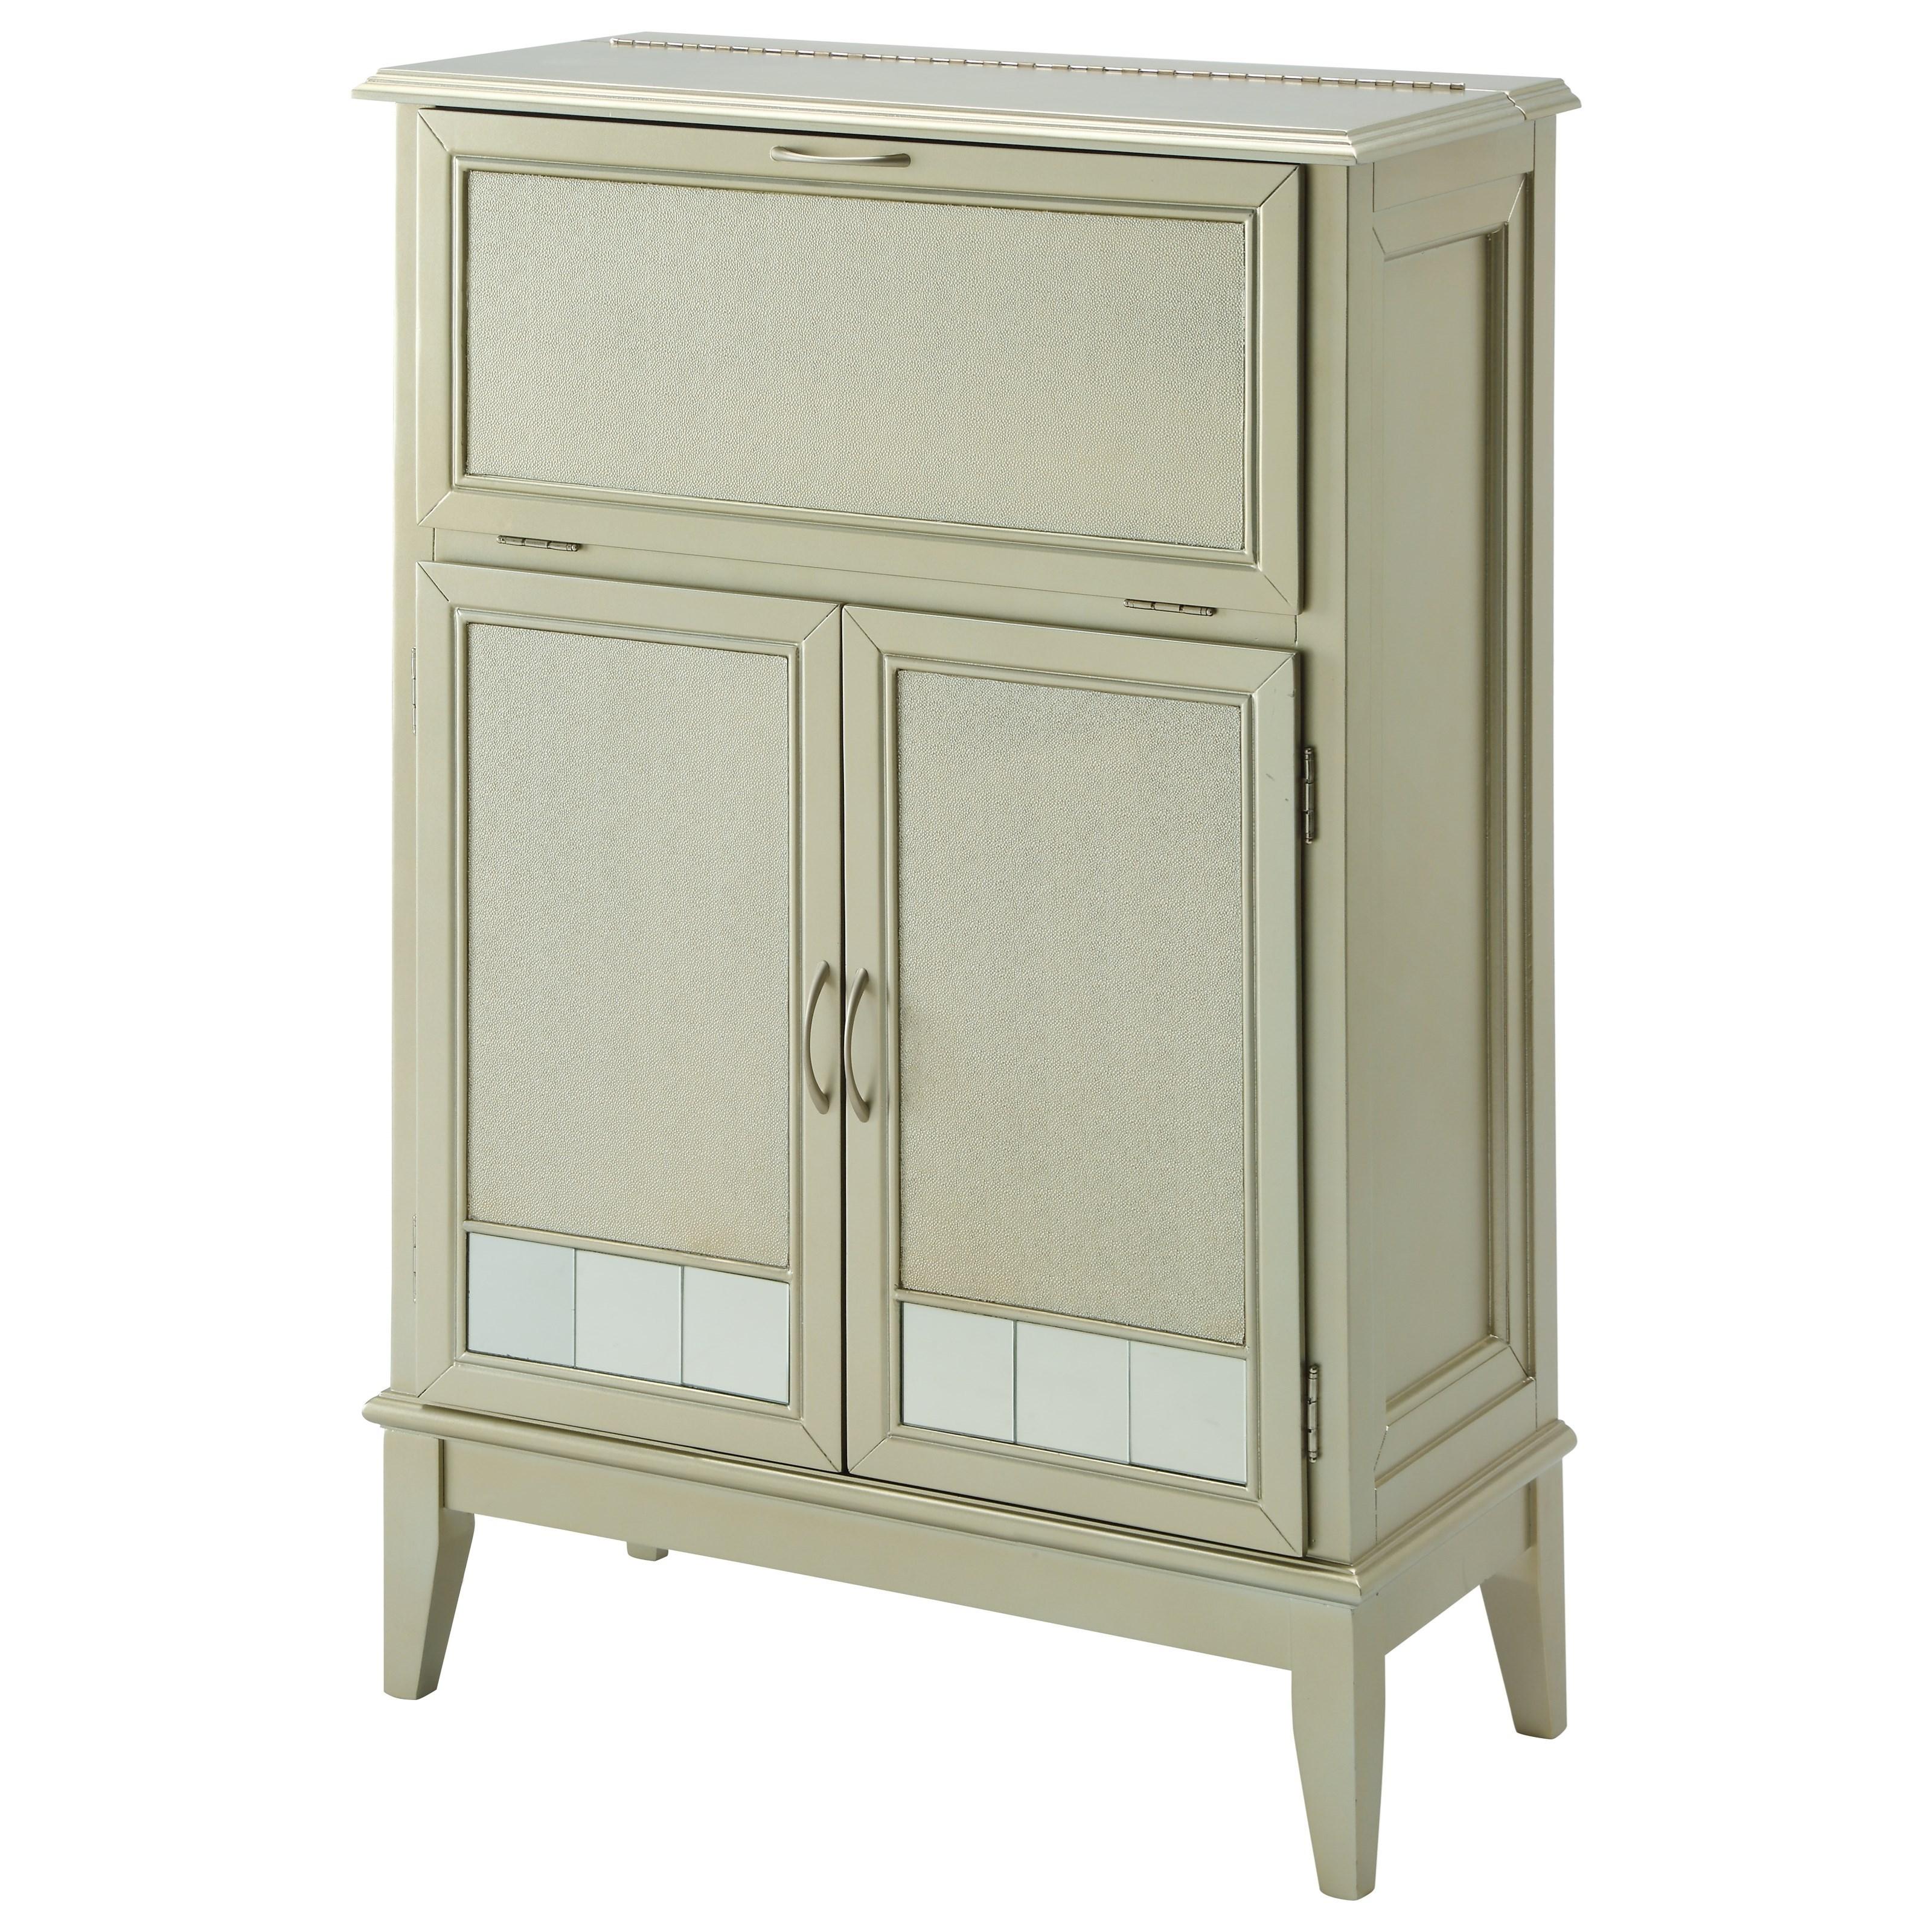 Coast to Coast Imports Coast to Coast Accents Two Door Drop Lid Bar Cabinet - Item Number: 91705